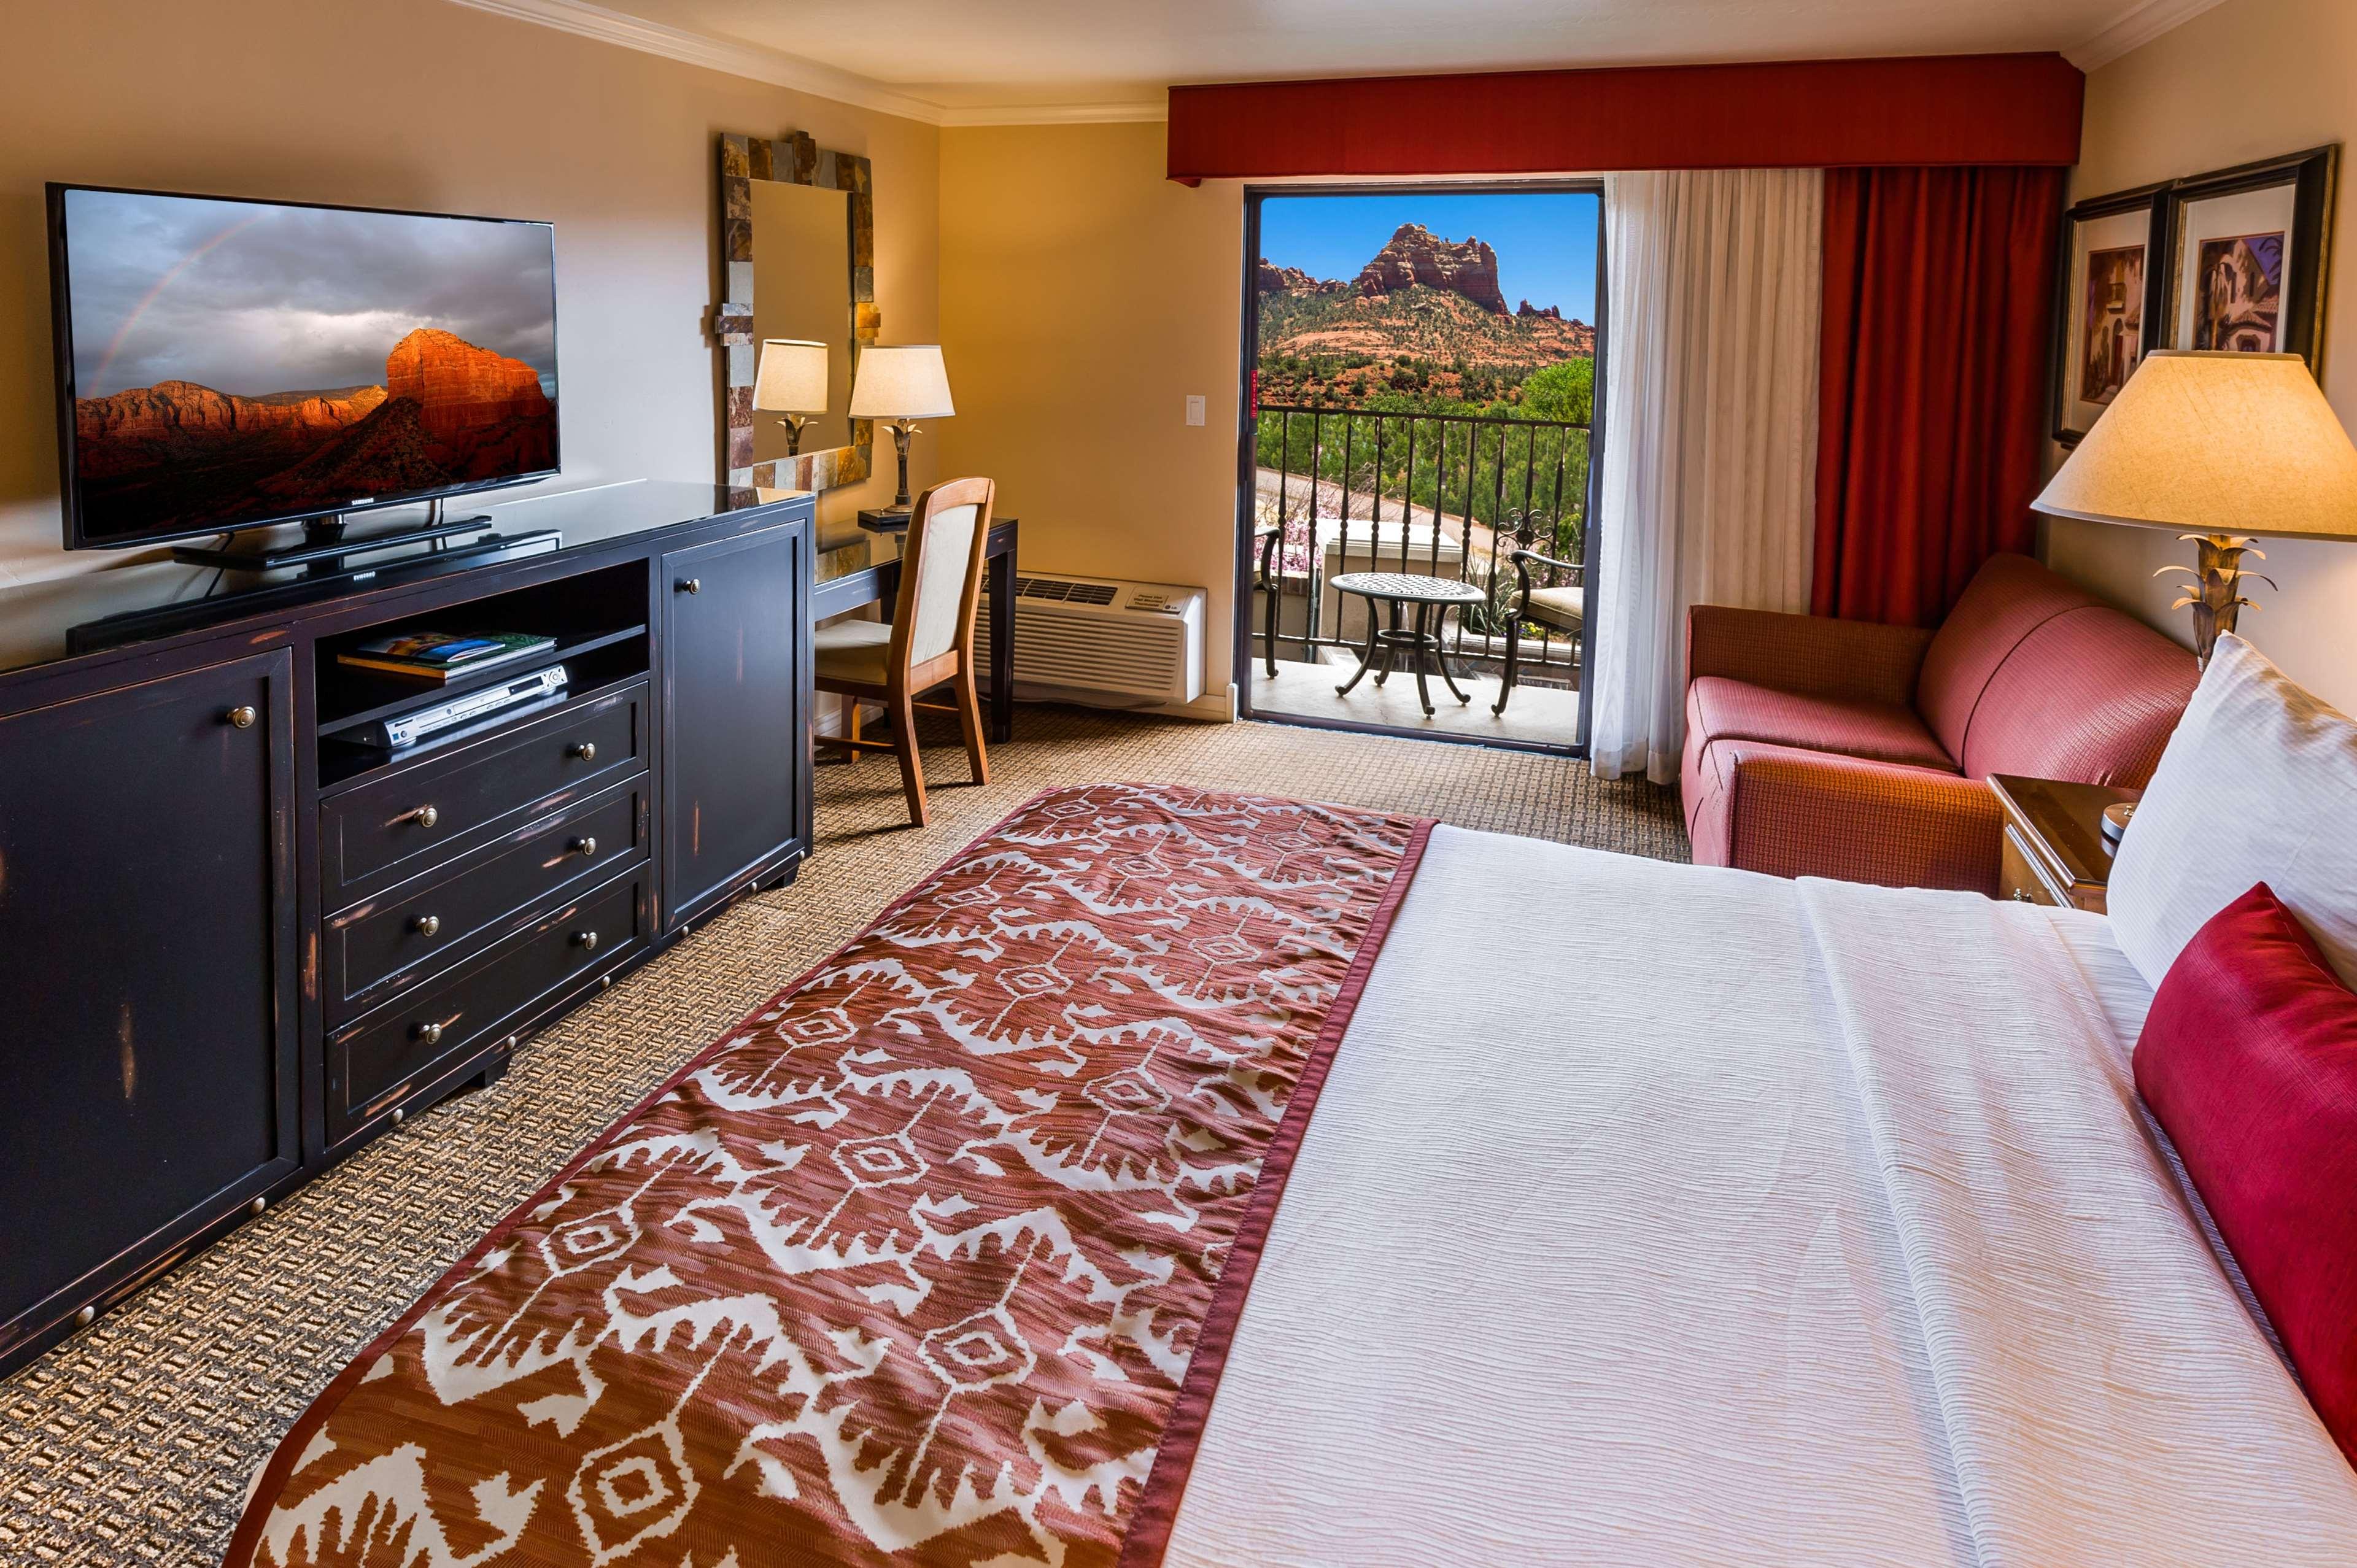 Best Western Plus Arroyo Roble Hotel & Creekside Villas image 42